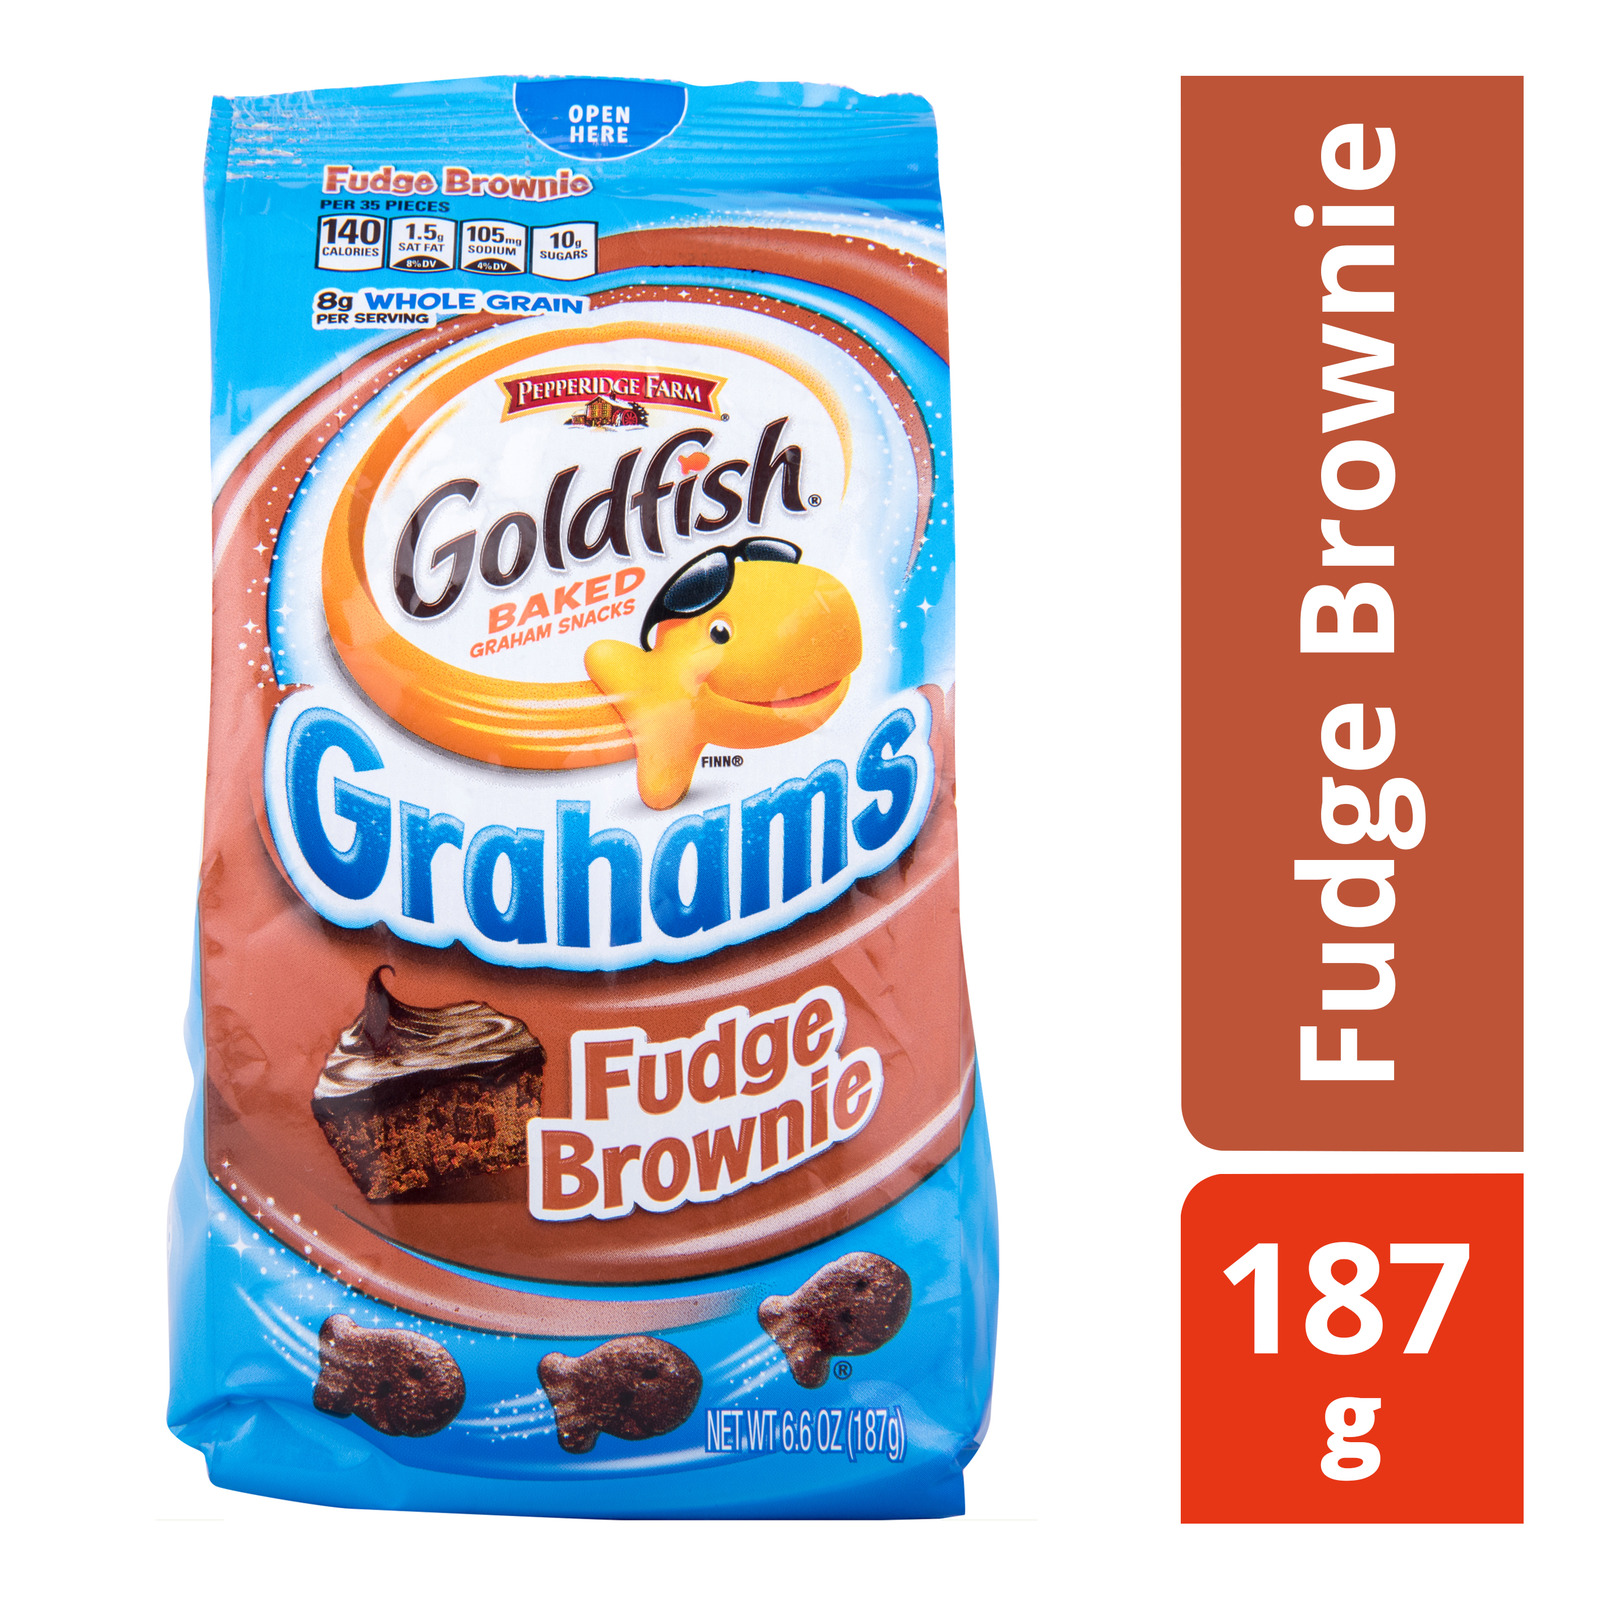 Pepperidge Farm Goldfish Baked Grahams - Fudge Brownie